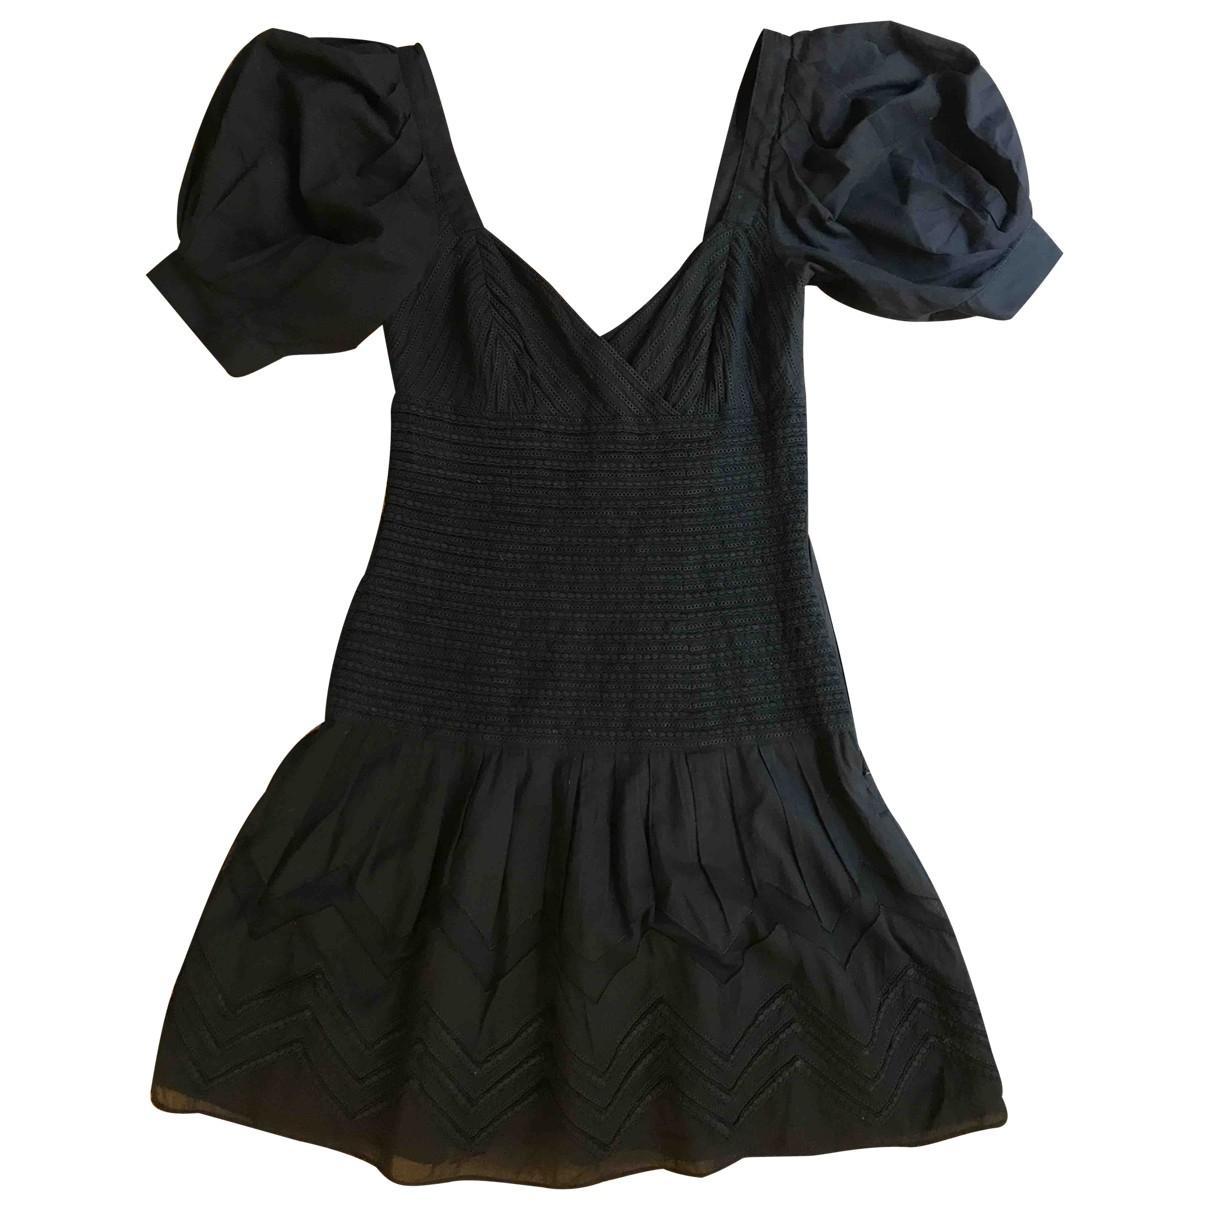 Catherine Malandrino \N Kleid in  Schwarz Baumwolle